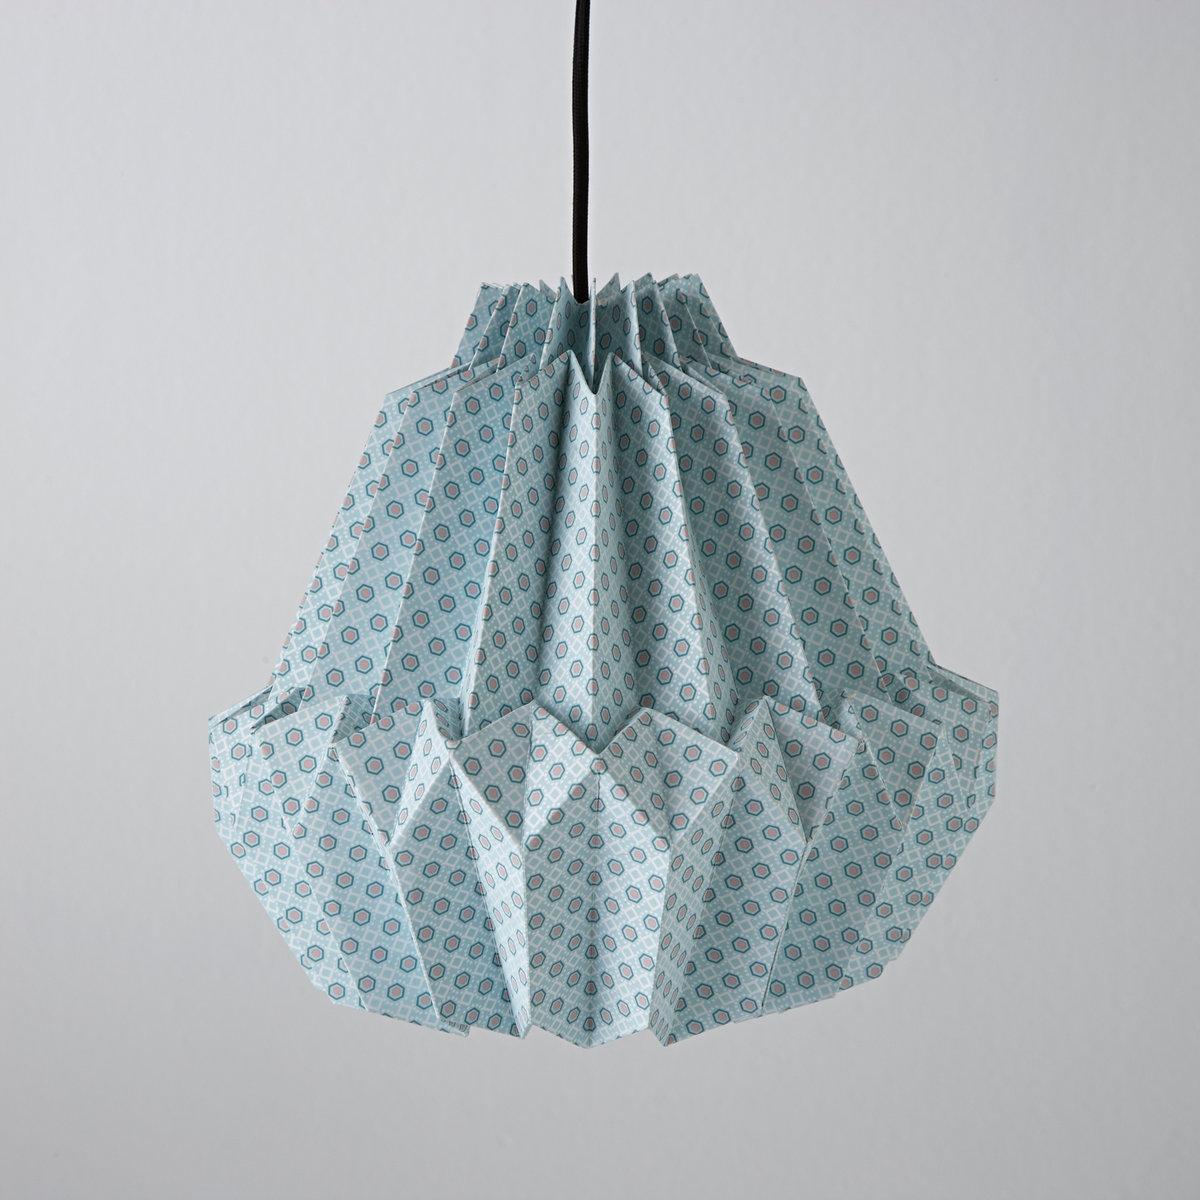 Светильник Shima чаша la rochere baikal комплект из 6 шт 620801